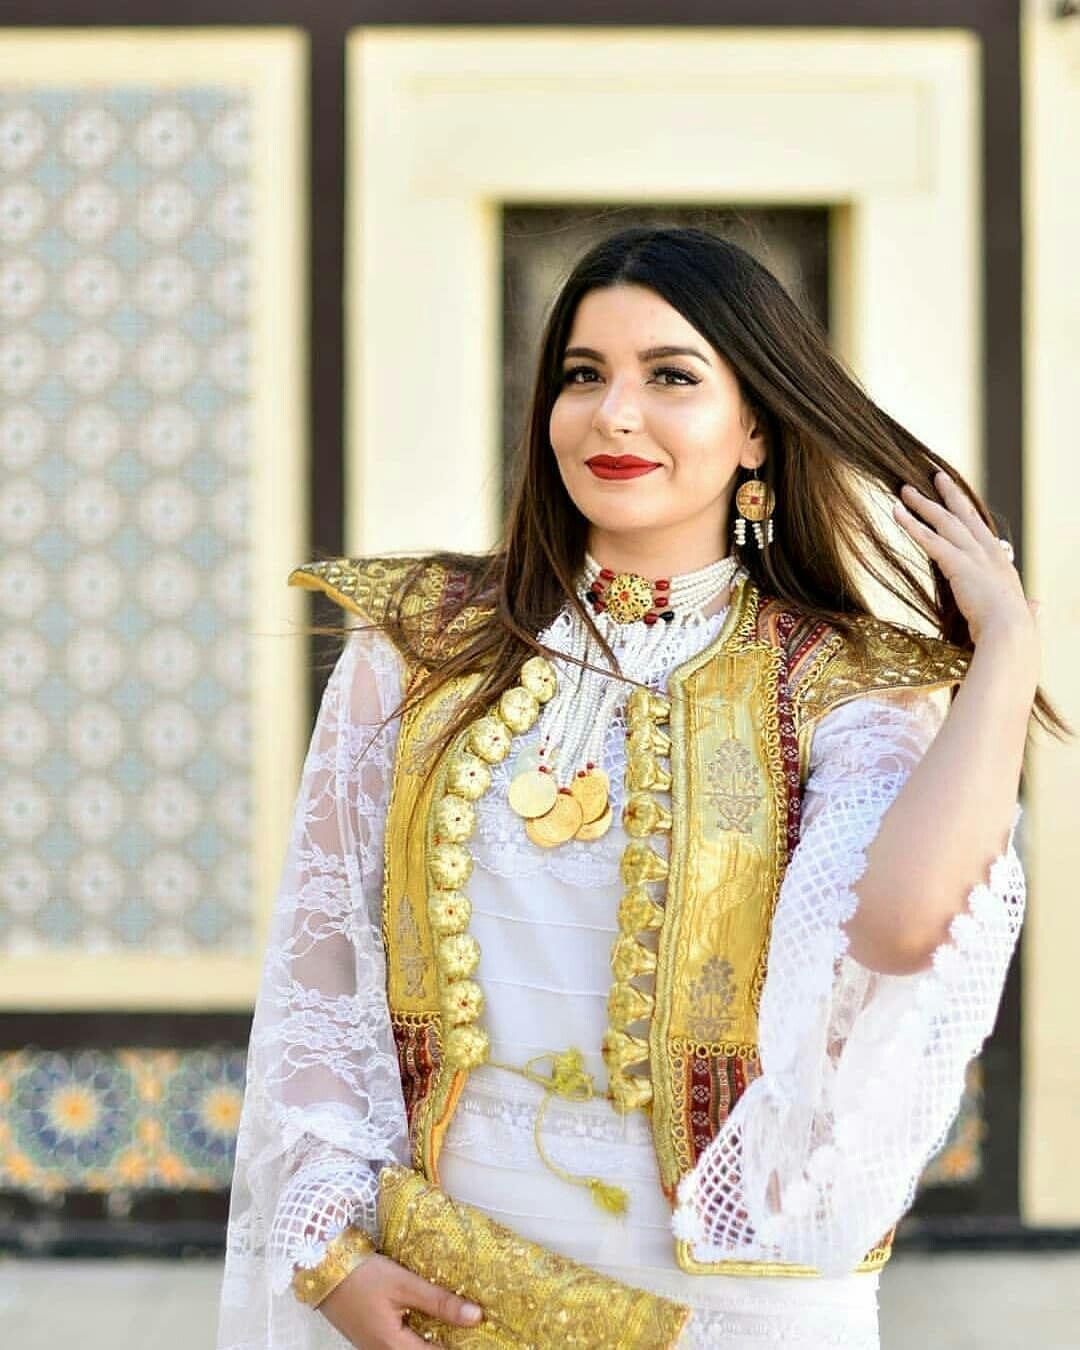 f26231017 الكسوة التونسية التقليدية 😍 | traditional in 2019 | Robe ...